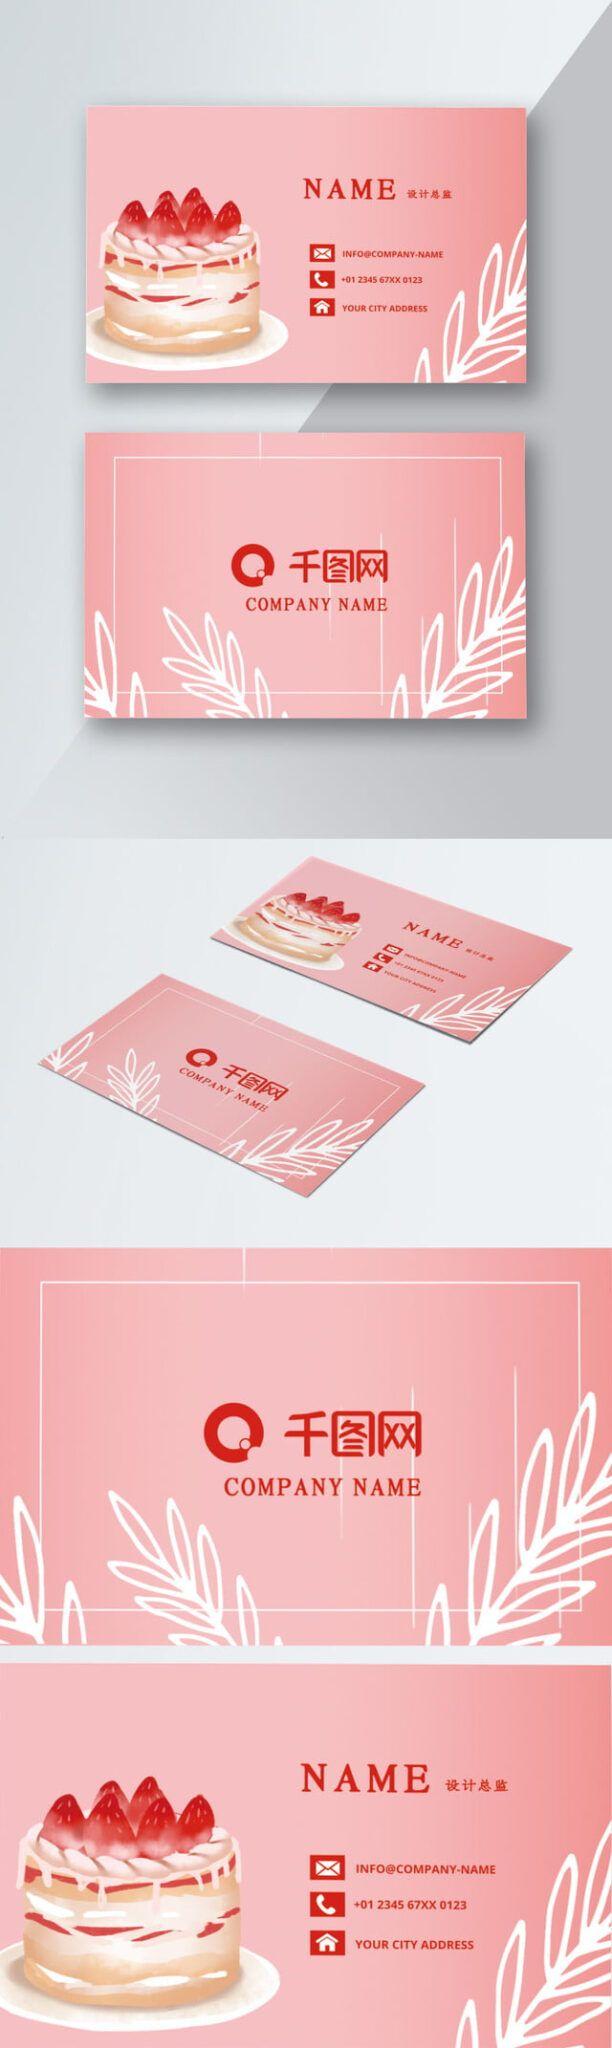 Cake Shop Business Card Baking Business Card Cake Business For Cake Business Free Business Card Templates Cake Business Cards Business Card Template Photoshop